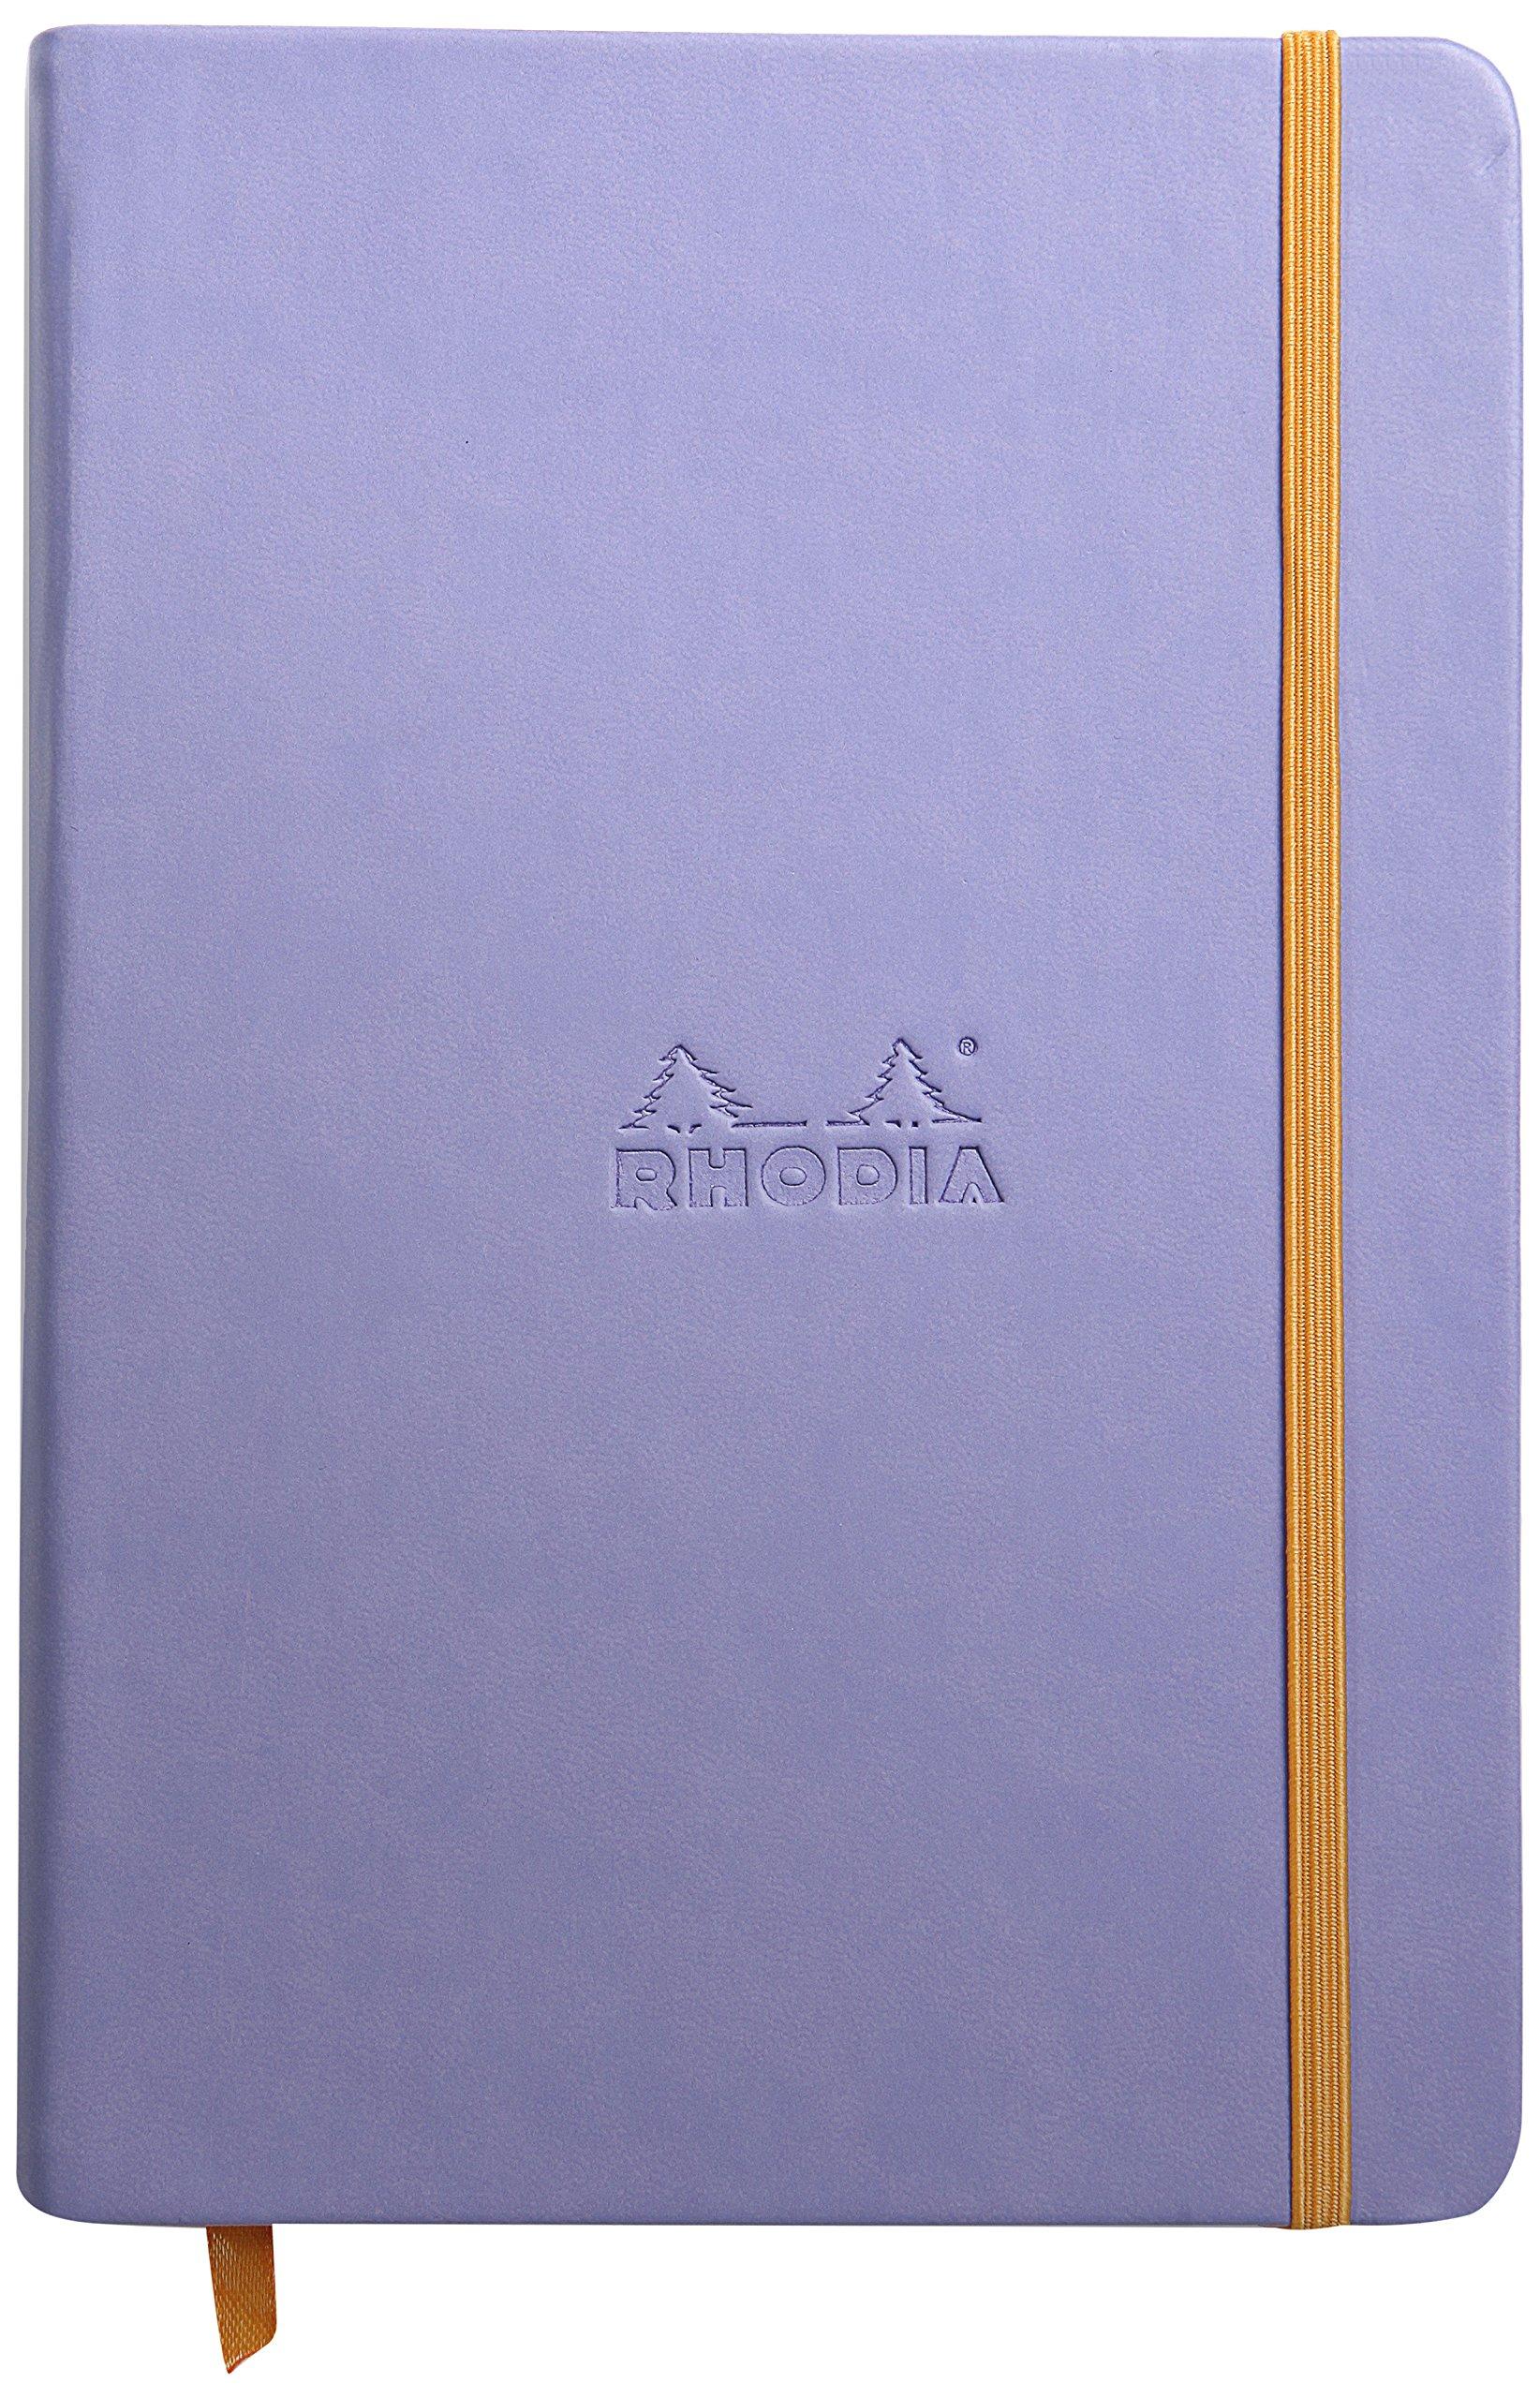 Rhodia Rhodiarama A5 Webnotebook, 5.5 in x 8.25, Lined - Iris (118749)